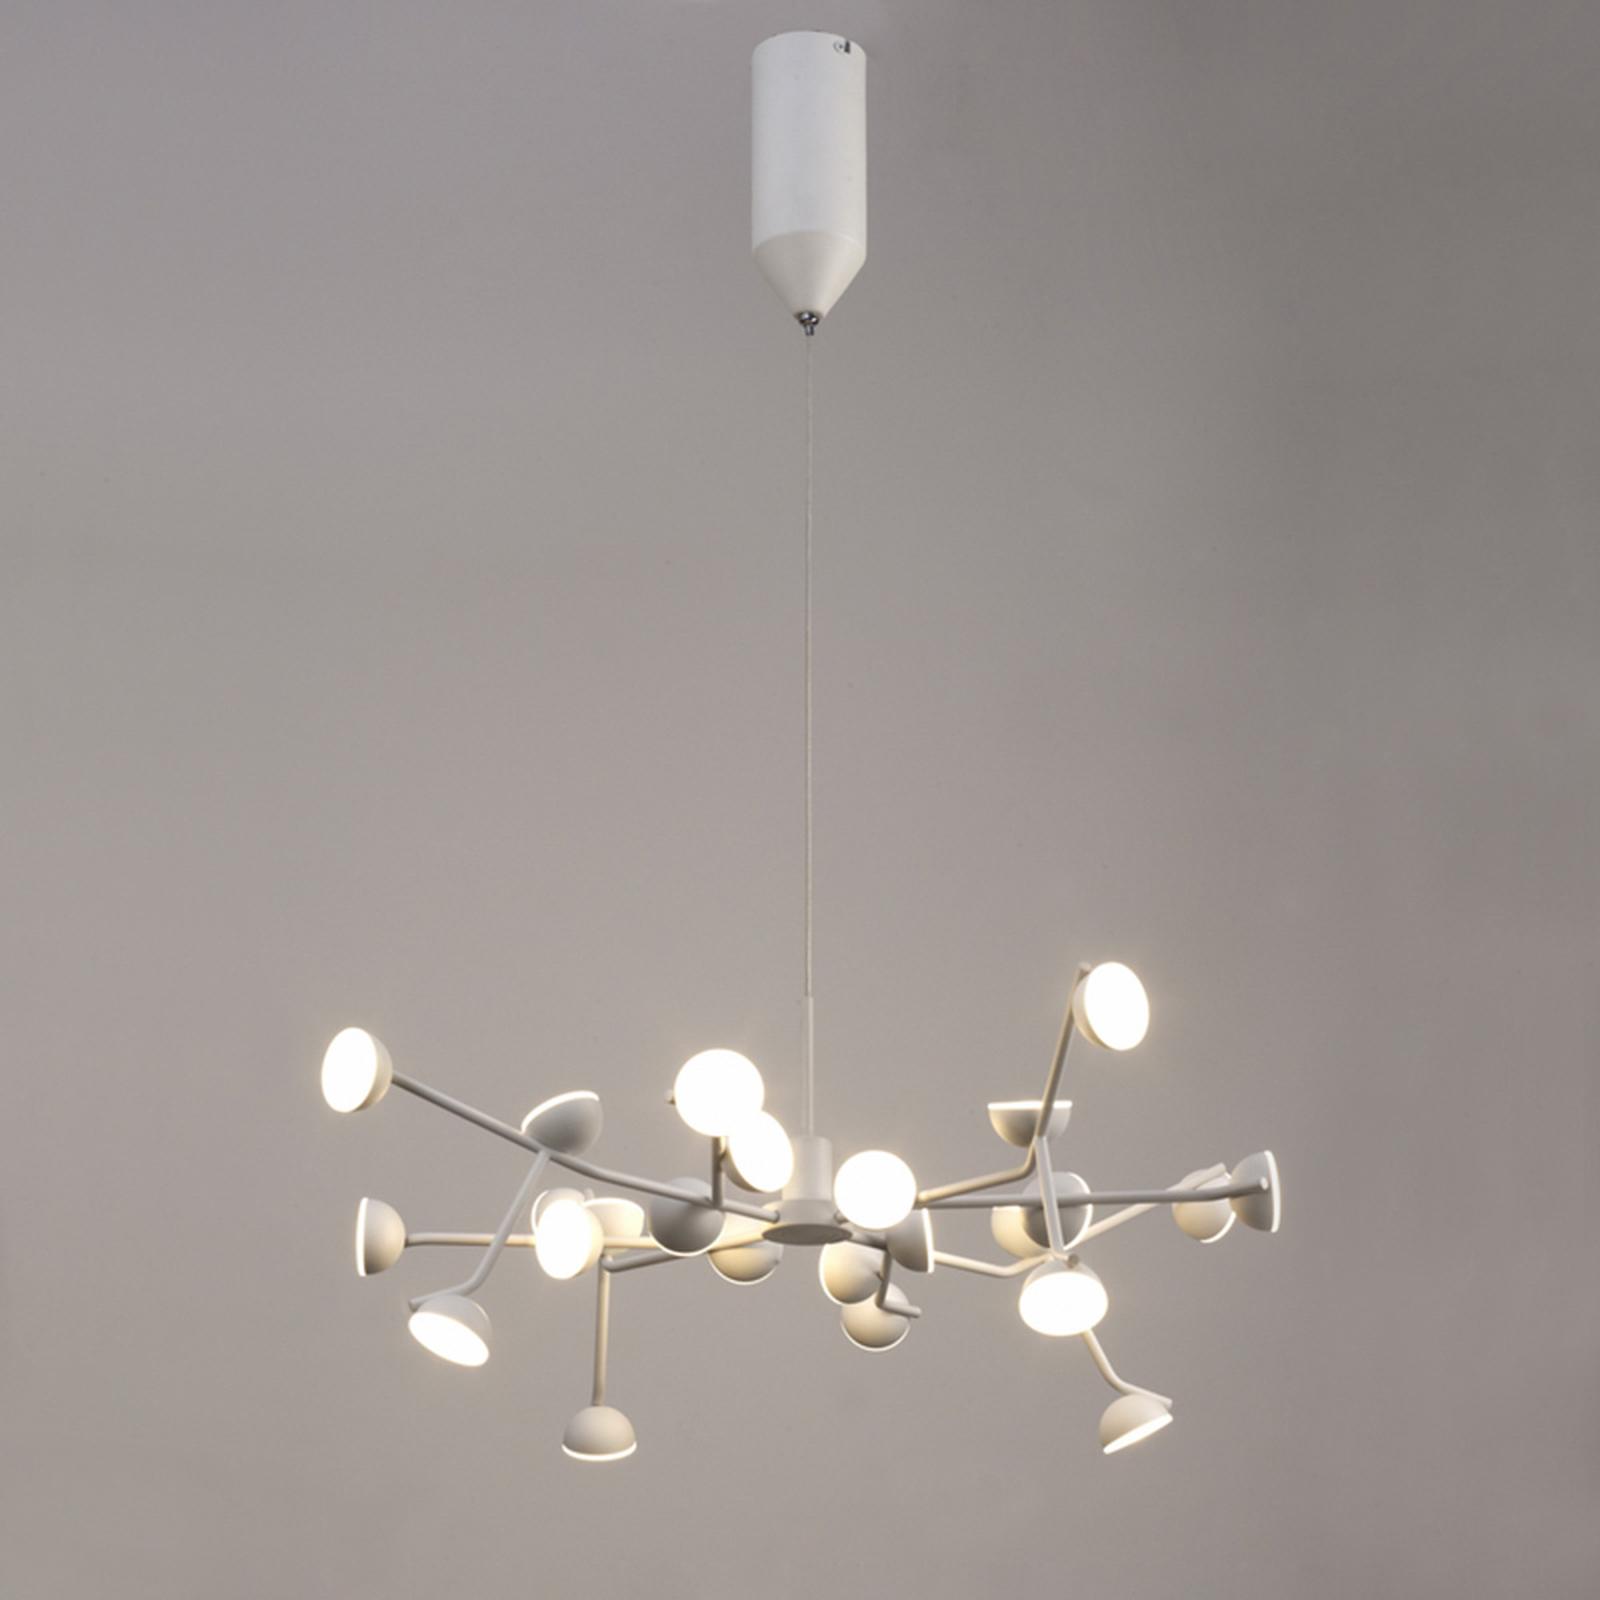 Lampa wisząca LED Adn, okrągły kształt 24-pkt.